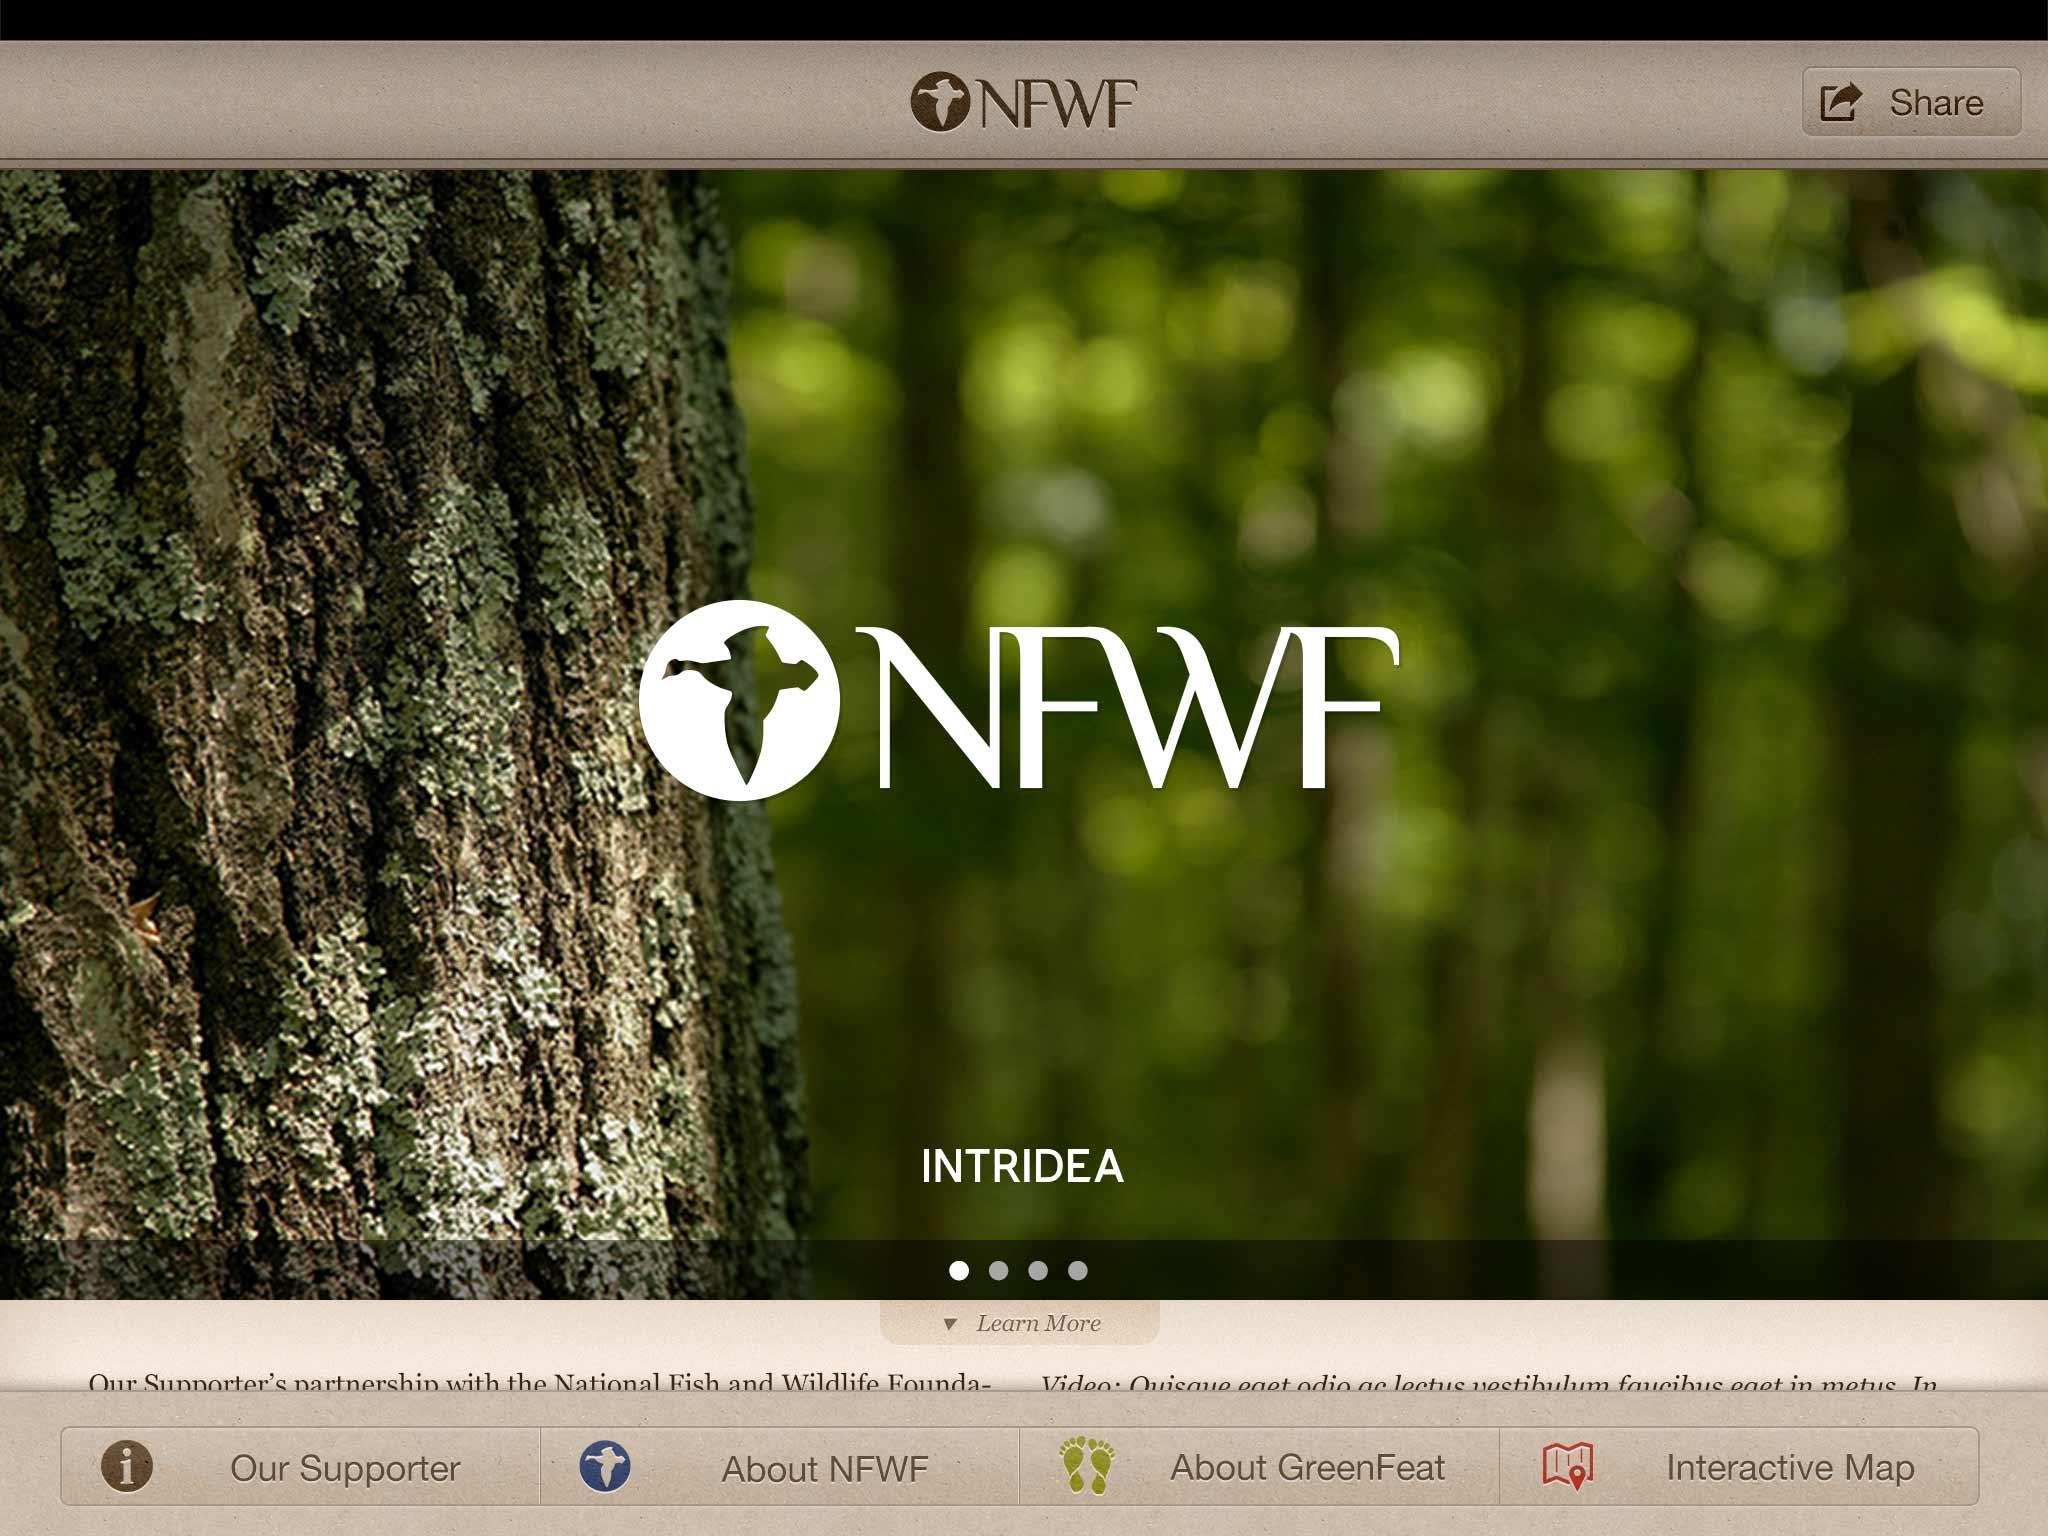 NFWF website